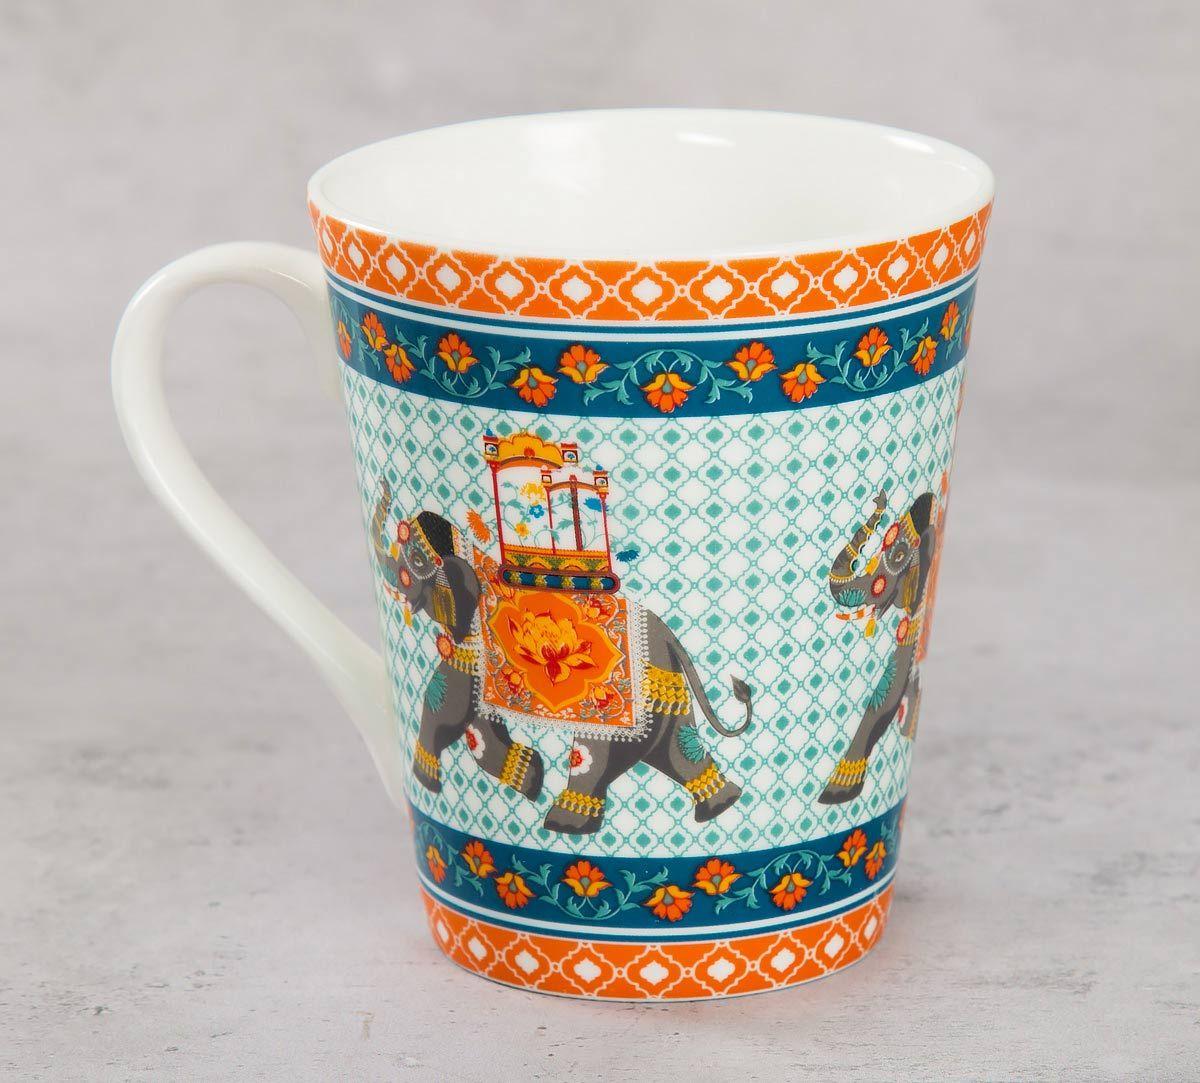 India Circus Swirling Safari Zing Mug (Set of 2)